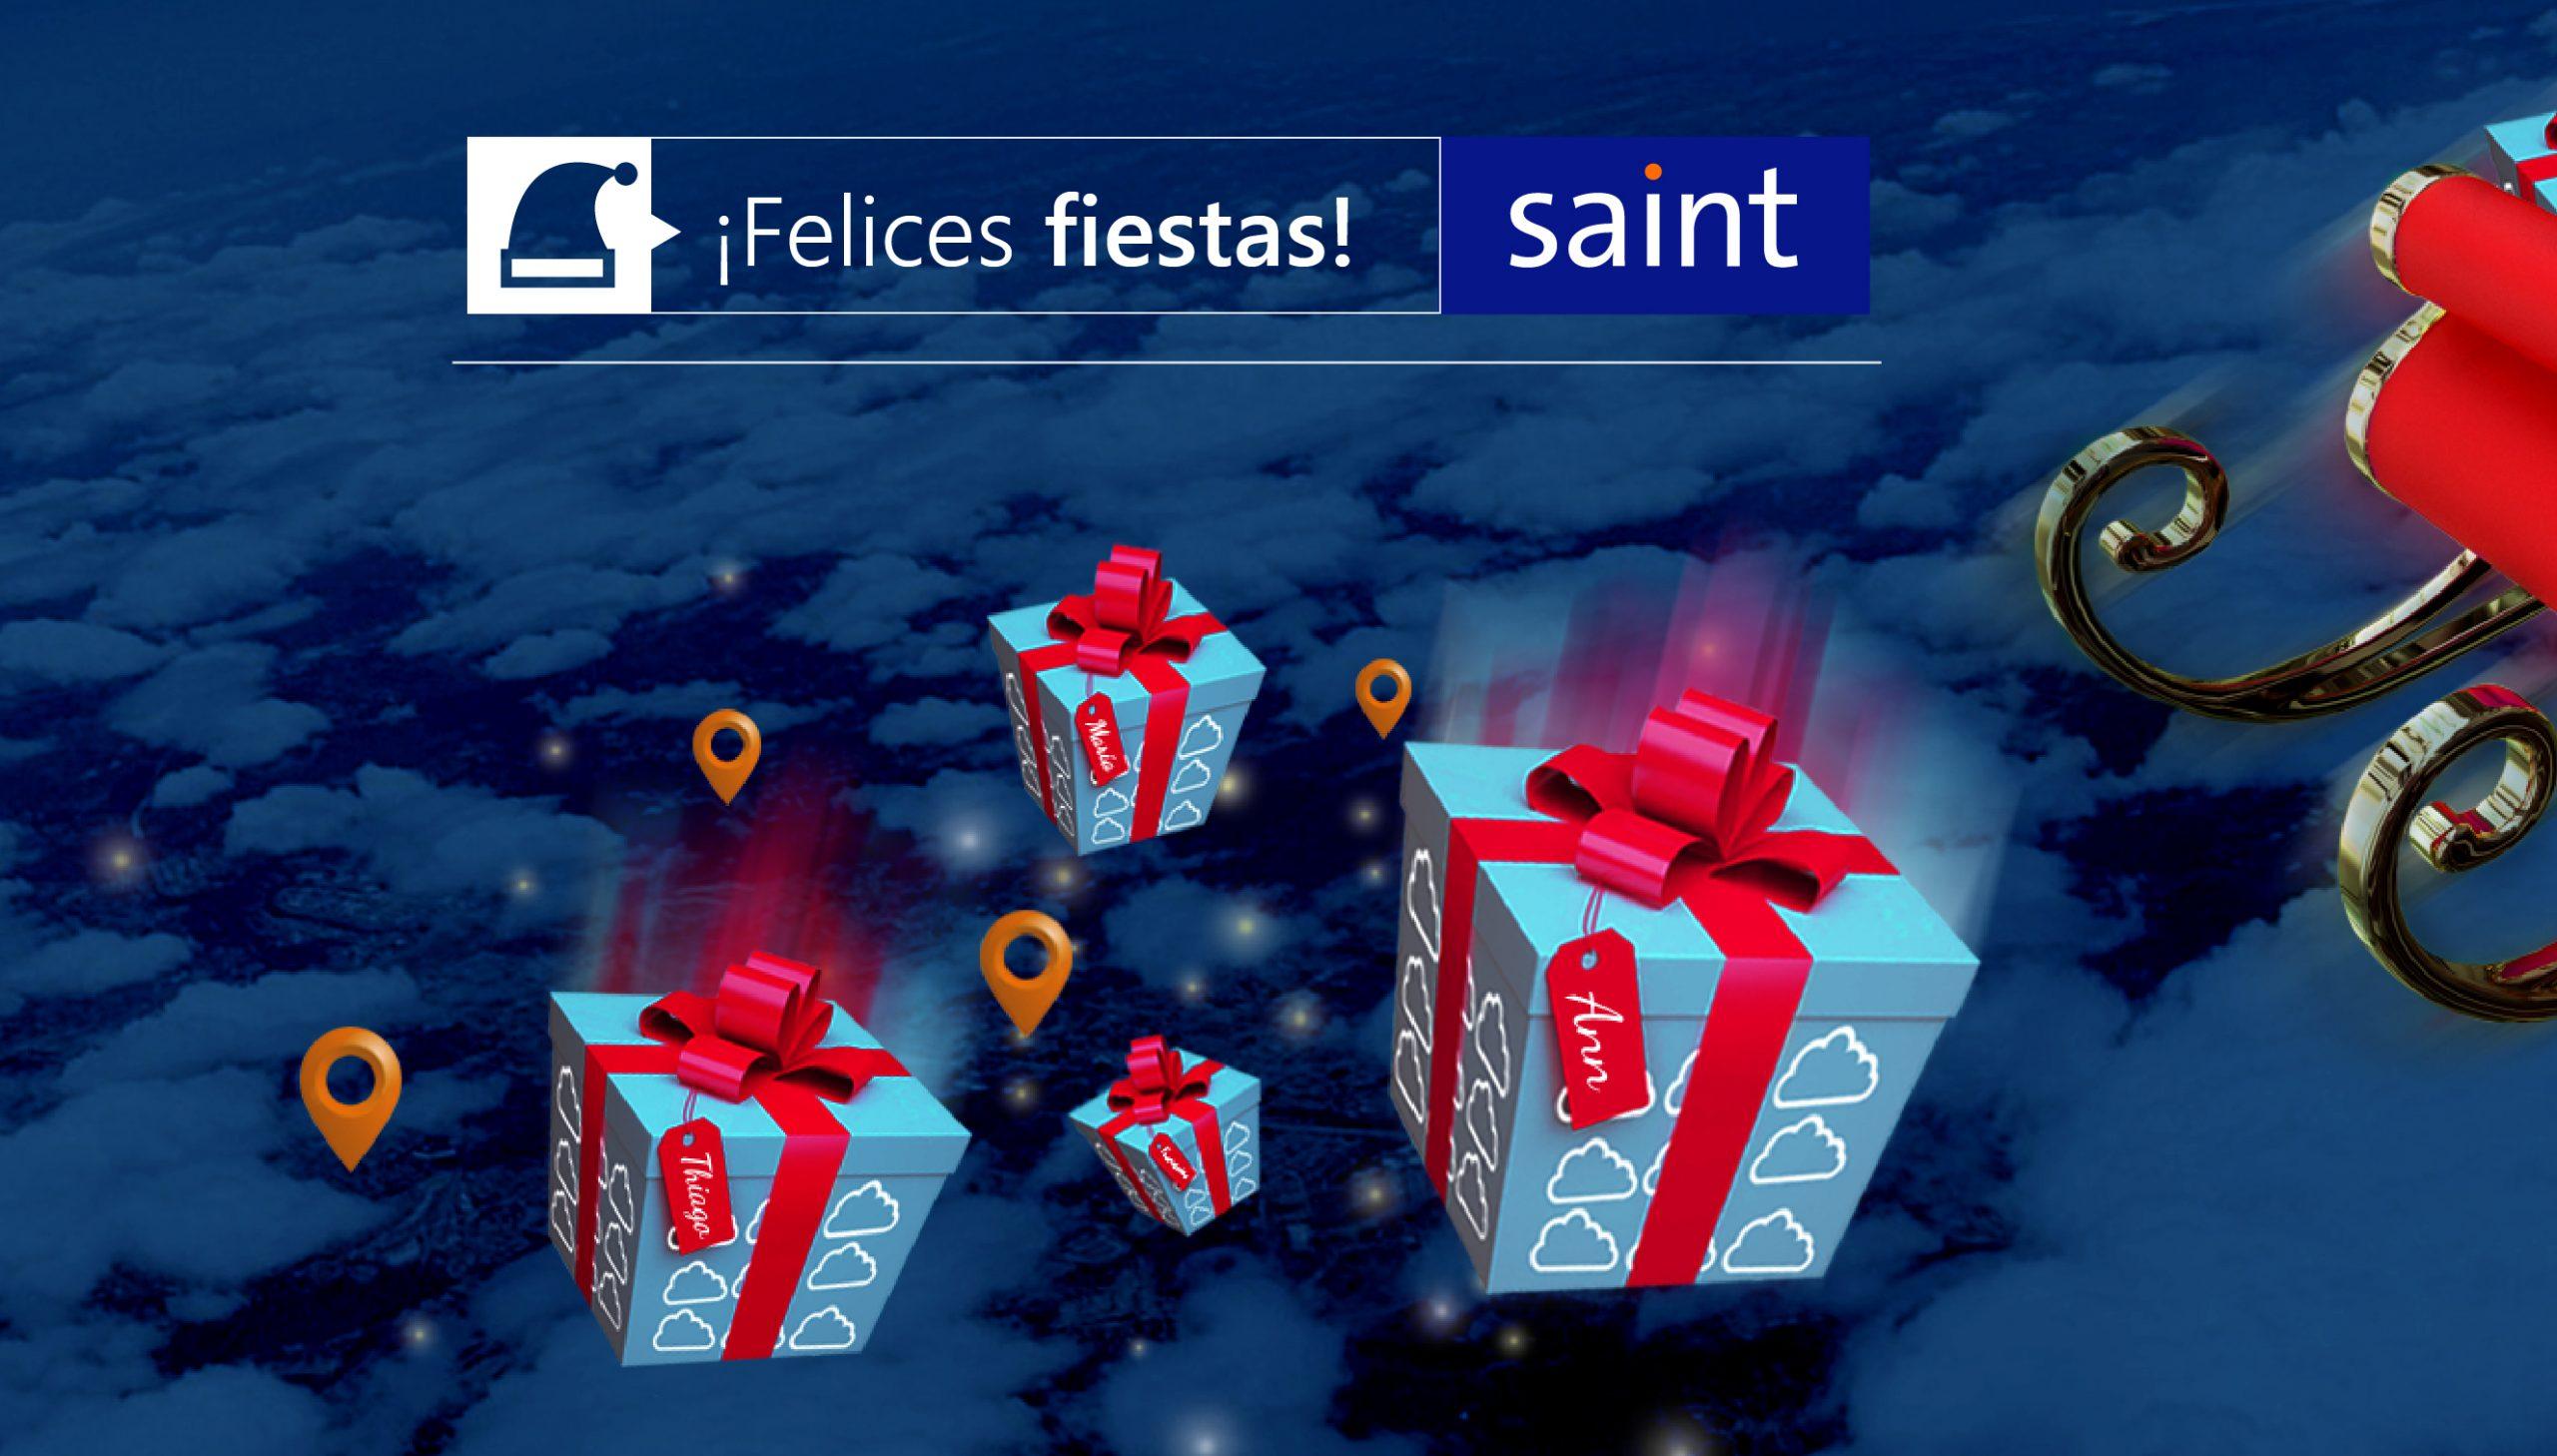 Felices fiestas 2016 les desea saint casa Matriz.